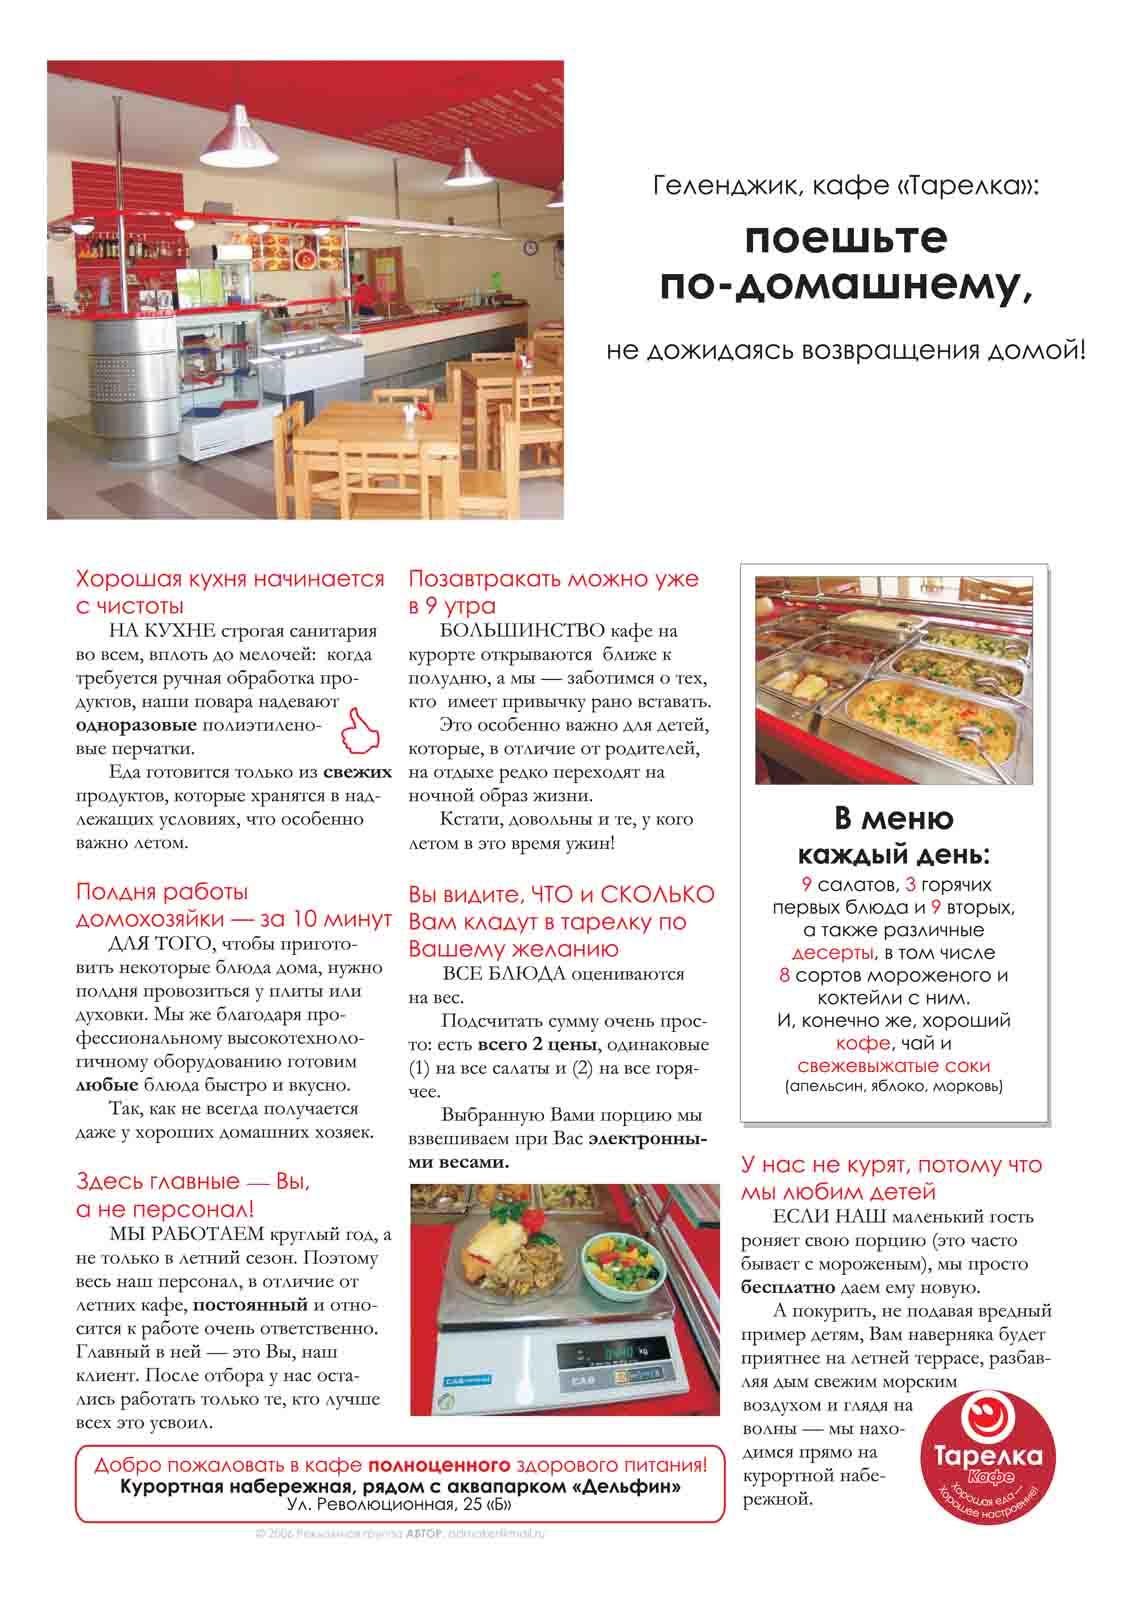 Печатная реклама, Денис Богомолов, кафе «Тарелка»